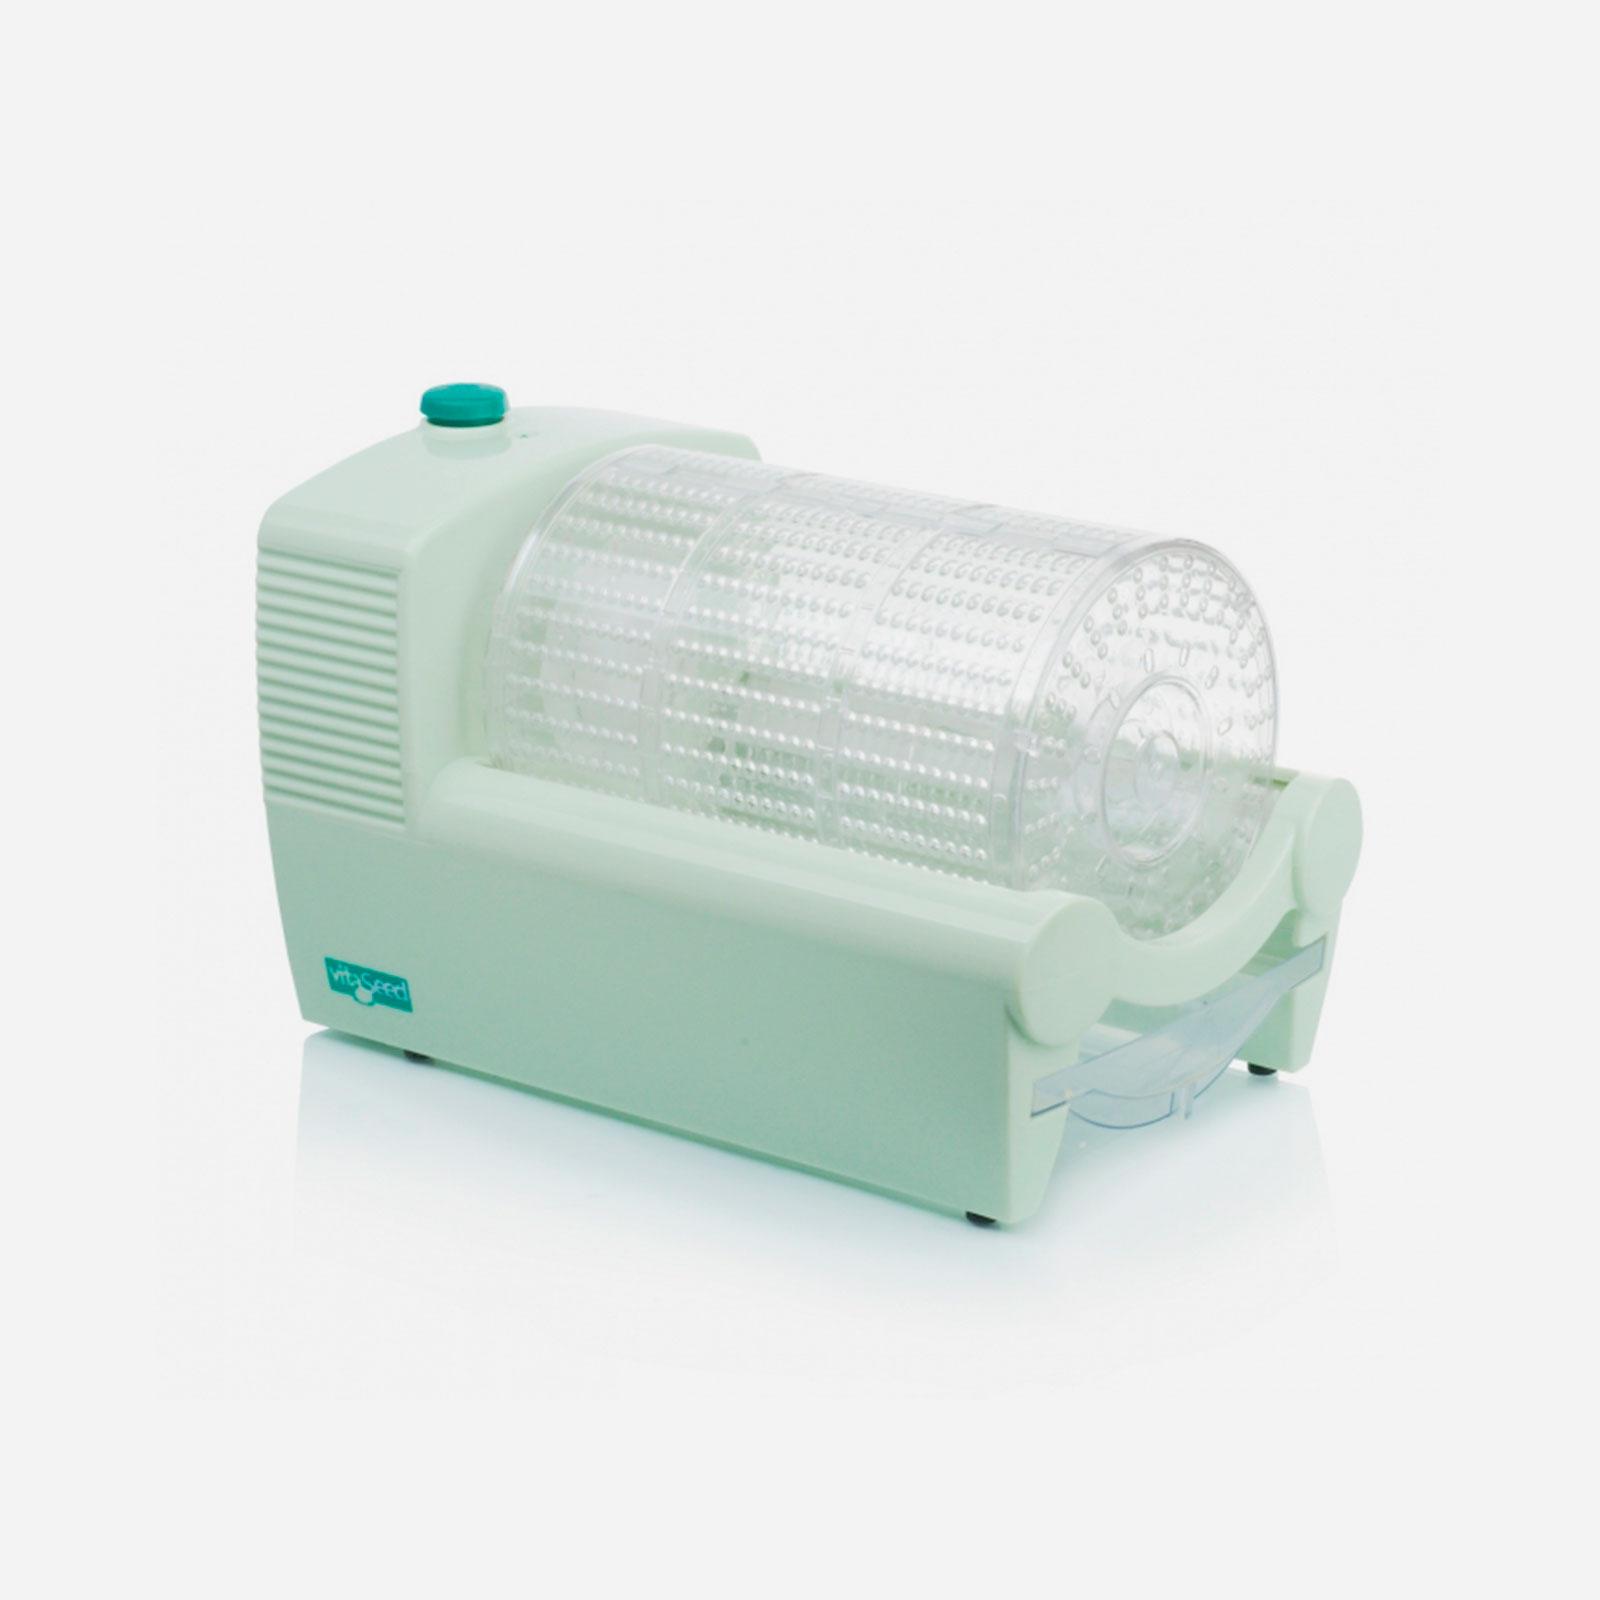 Прибор для автоматического проращивания семян